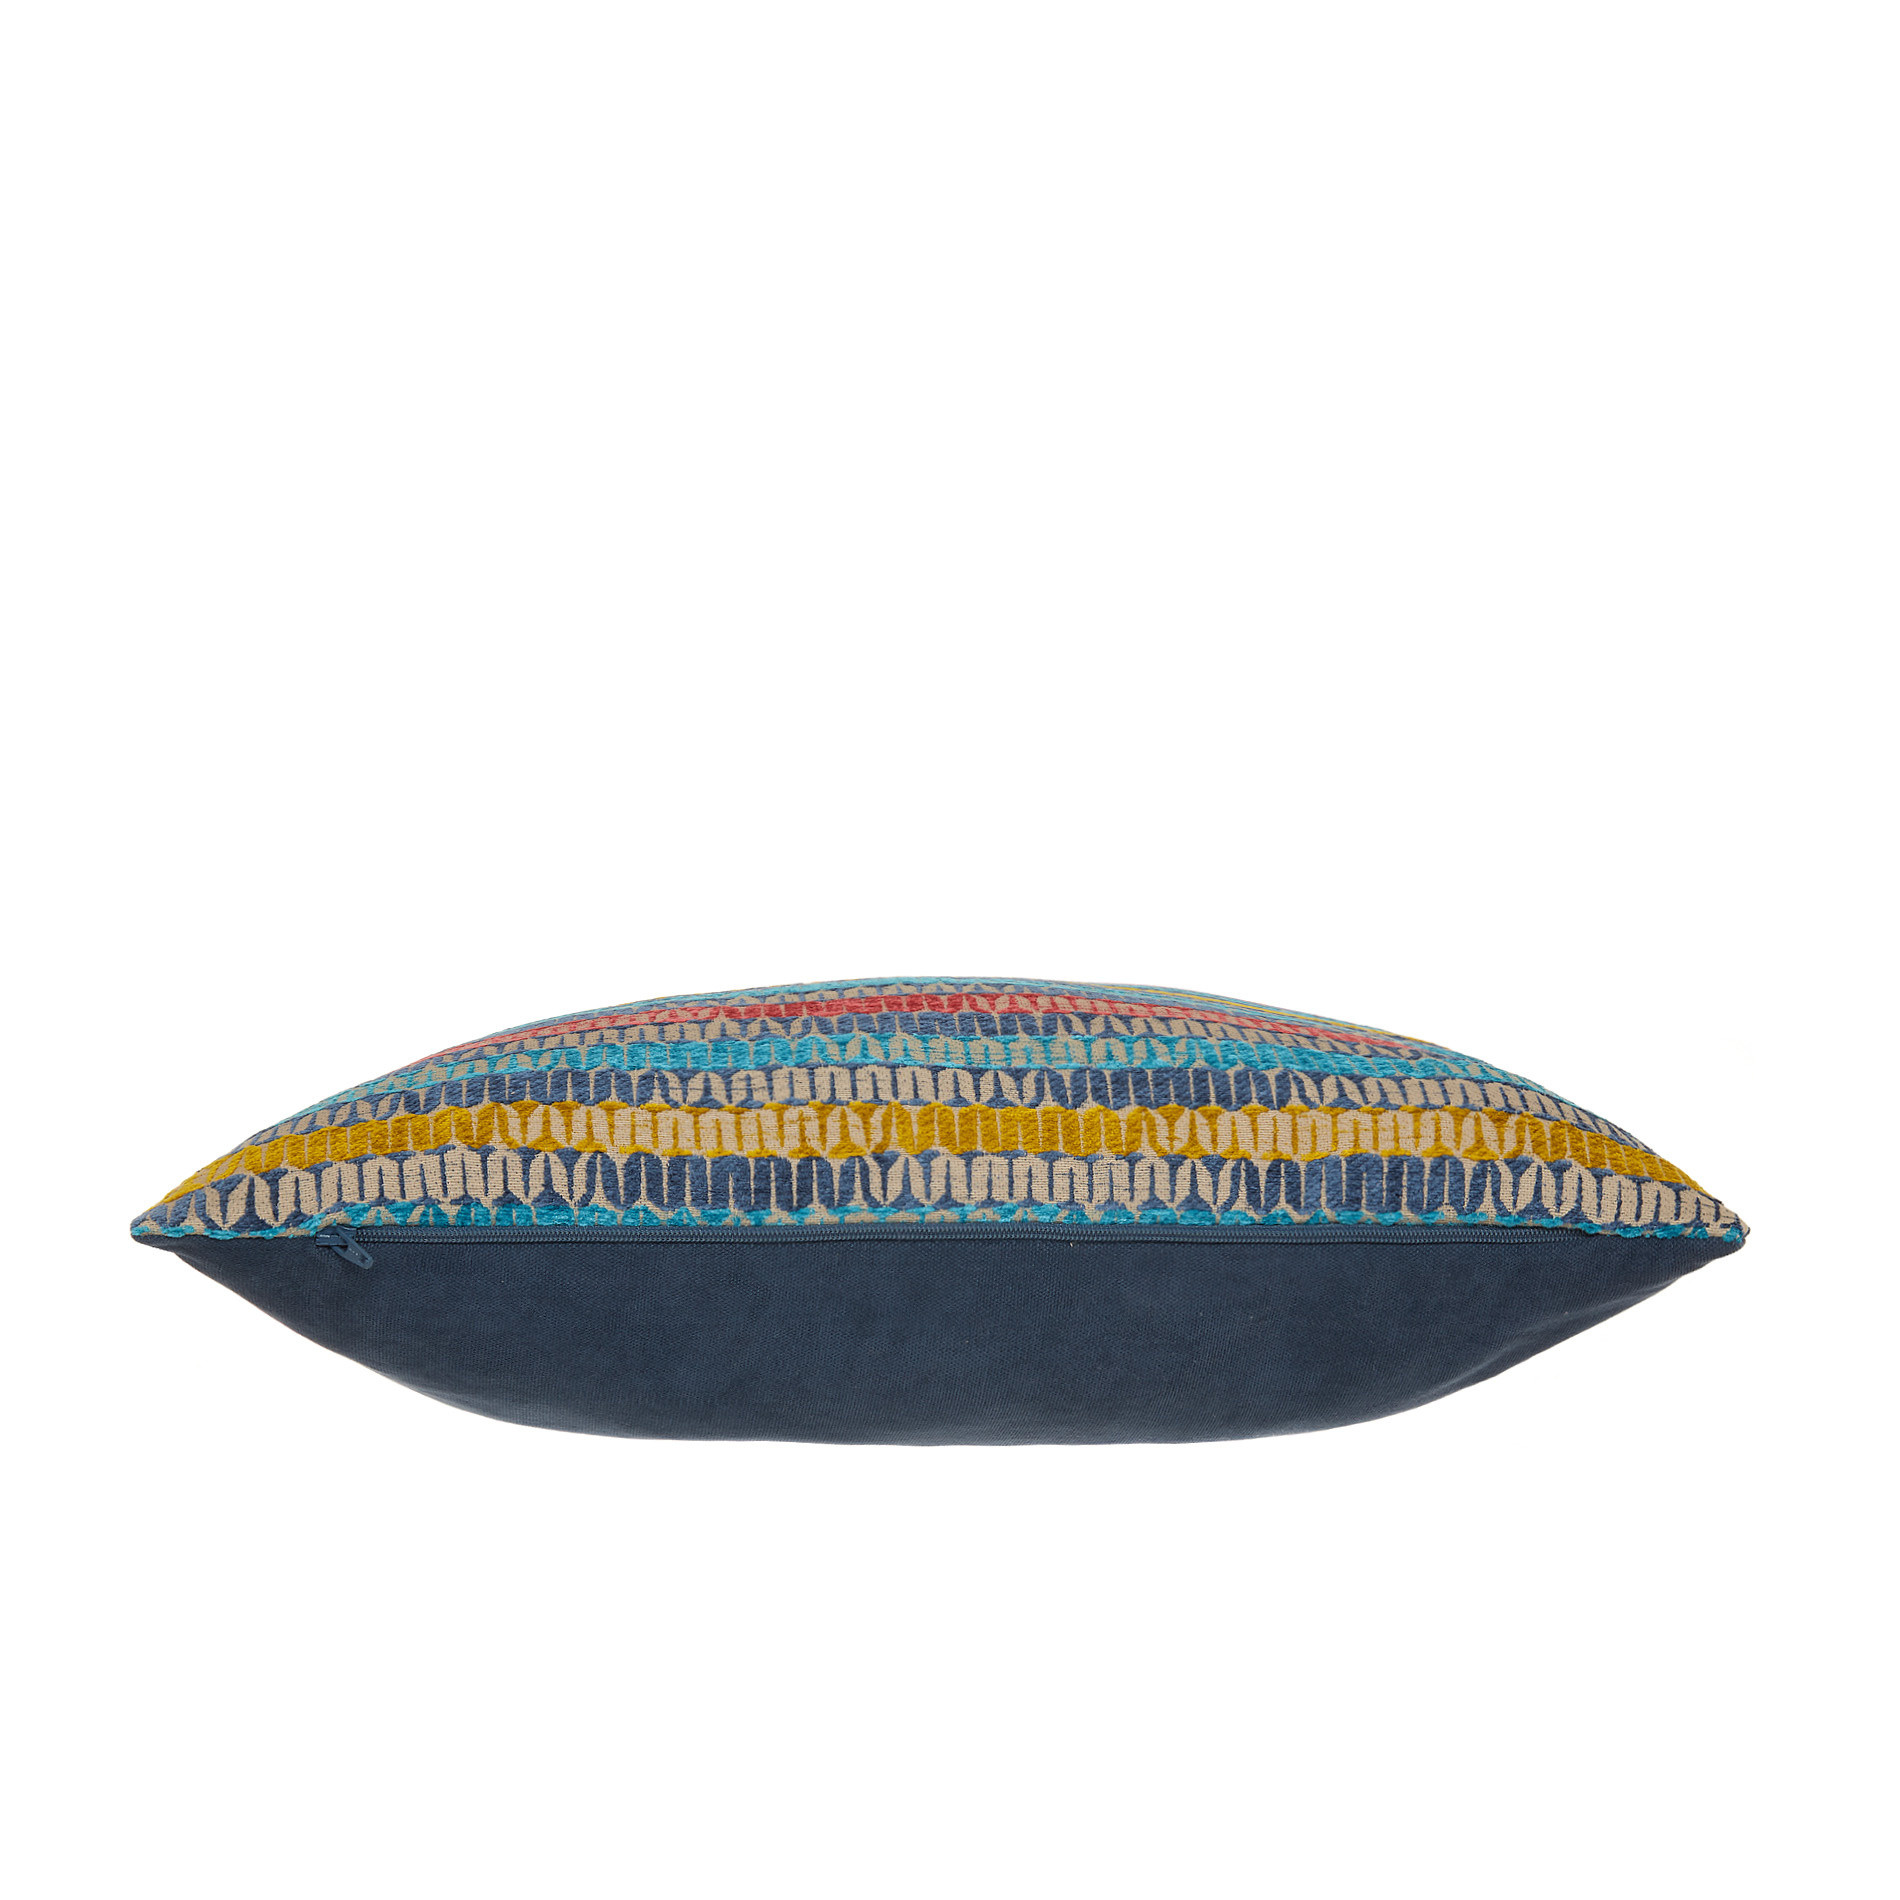 Cuscino jacquard motivo geometrico 43x43cm, Multicolor, large image number 2